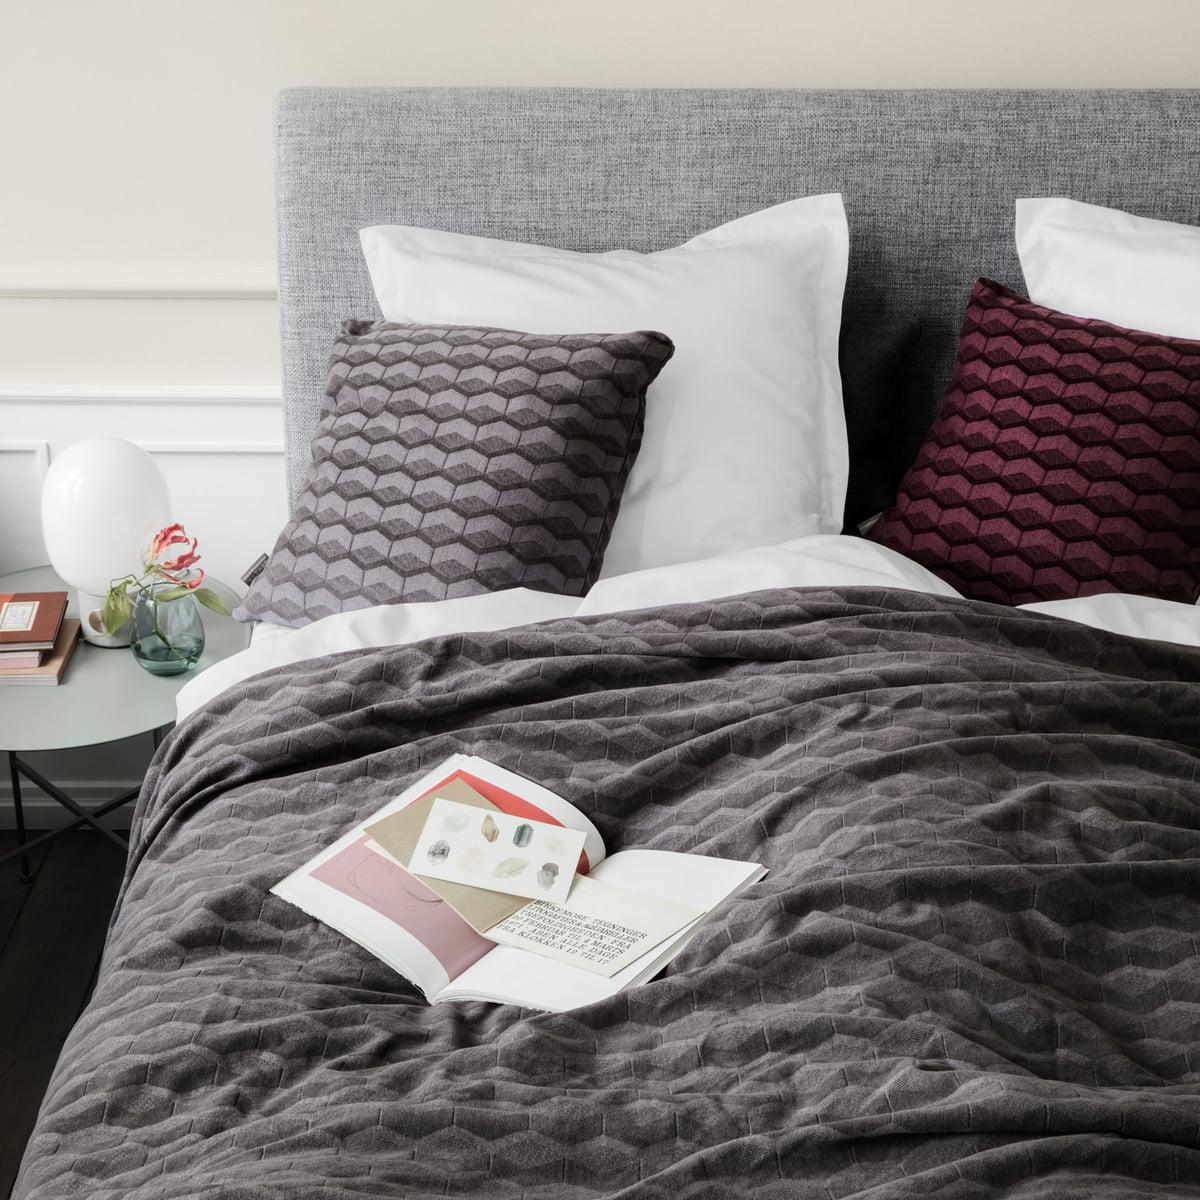 kubus tagesdecke von georg jensen damask. Black Bedroom Furniture Sets. Home Design Ideas